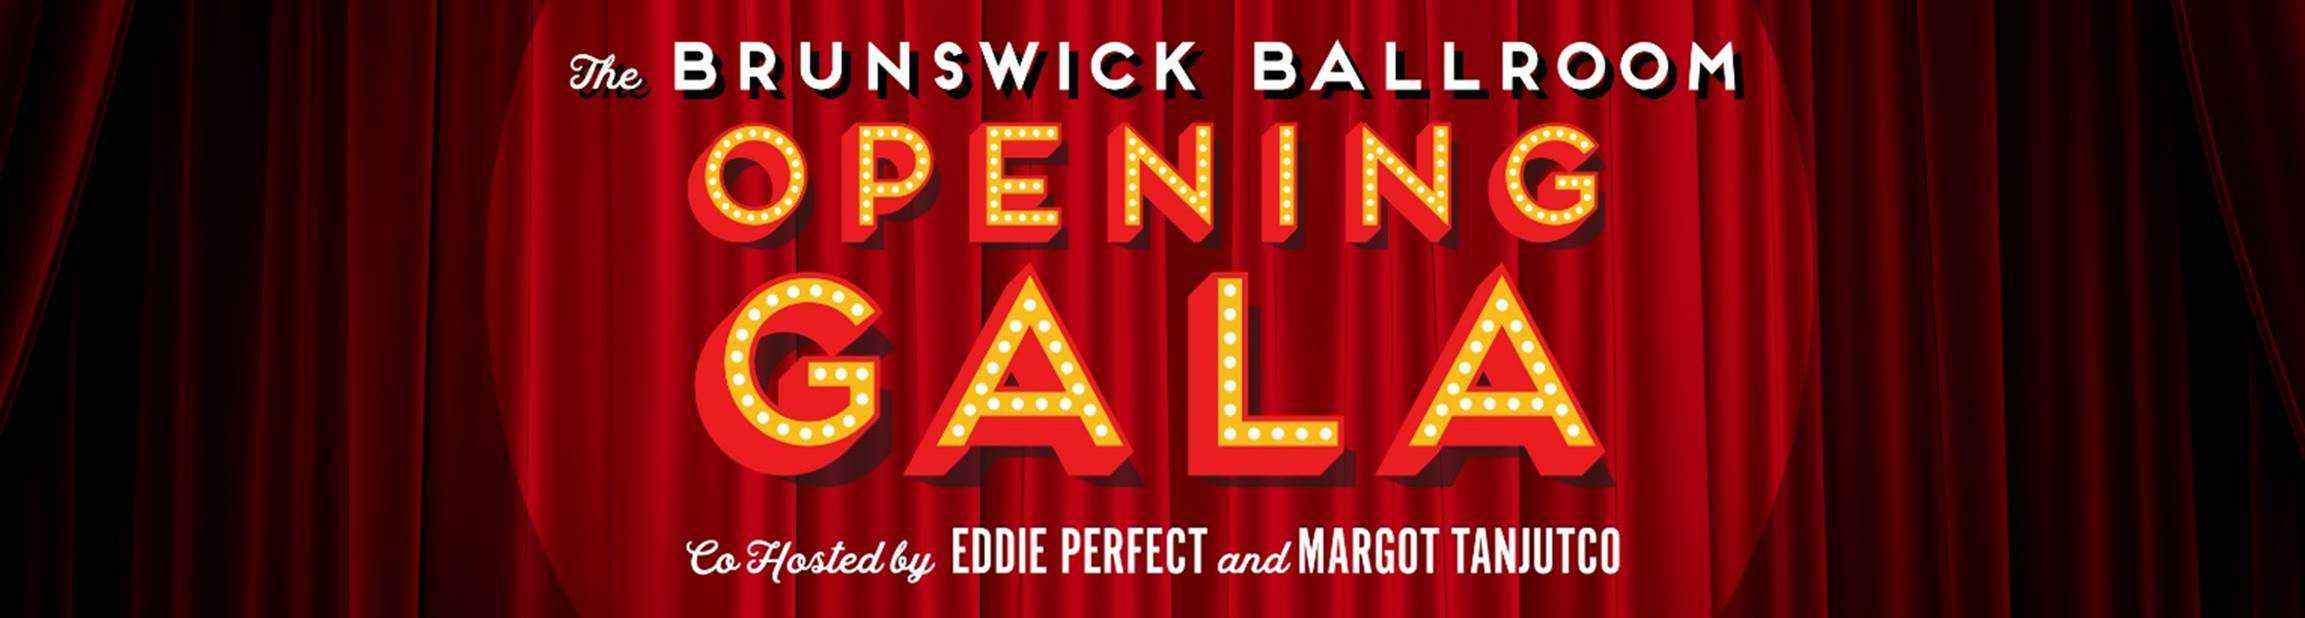 Scene News: Eddie Perfect & Margot Tanjutco To Co Host Brunswick Ballroom Opening Gala - March 4th & 5th